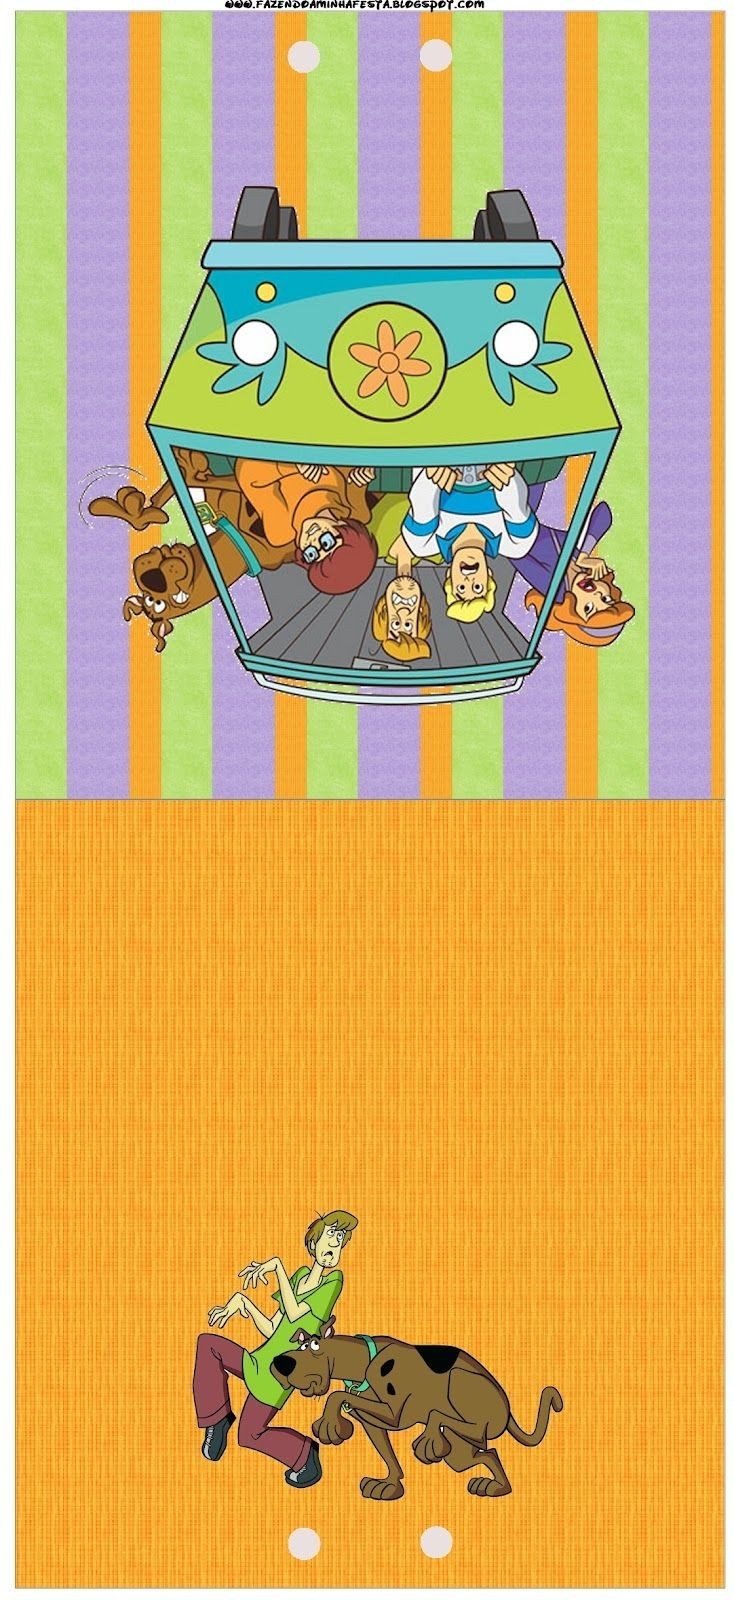 Scooby Doo Papercraft Scooby Doo Kit Pleto Molduras Para Convites R³tulos Para